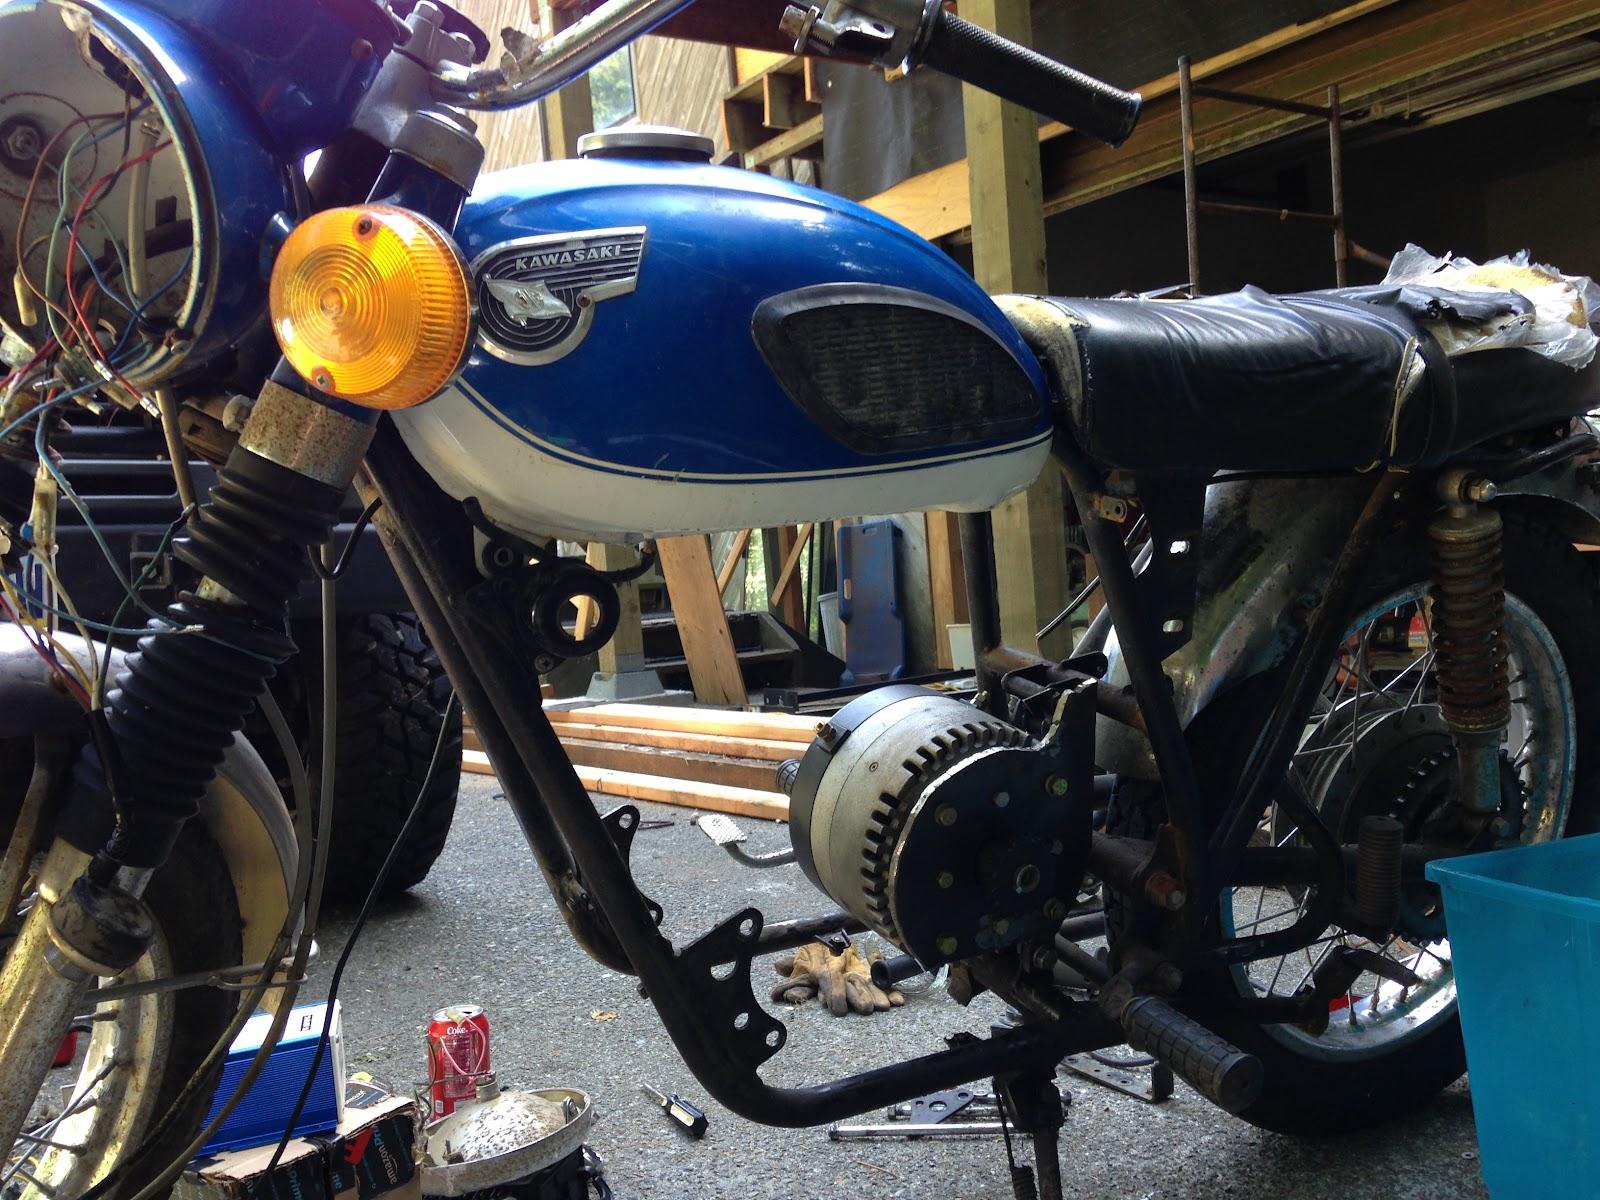 1967 Kawasaki A1 Ss Electric Conversion Adventure Rider